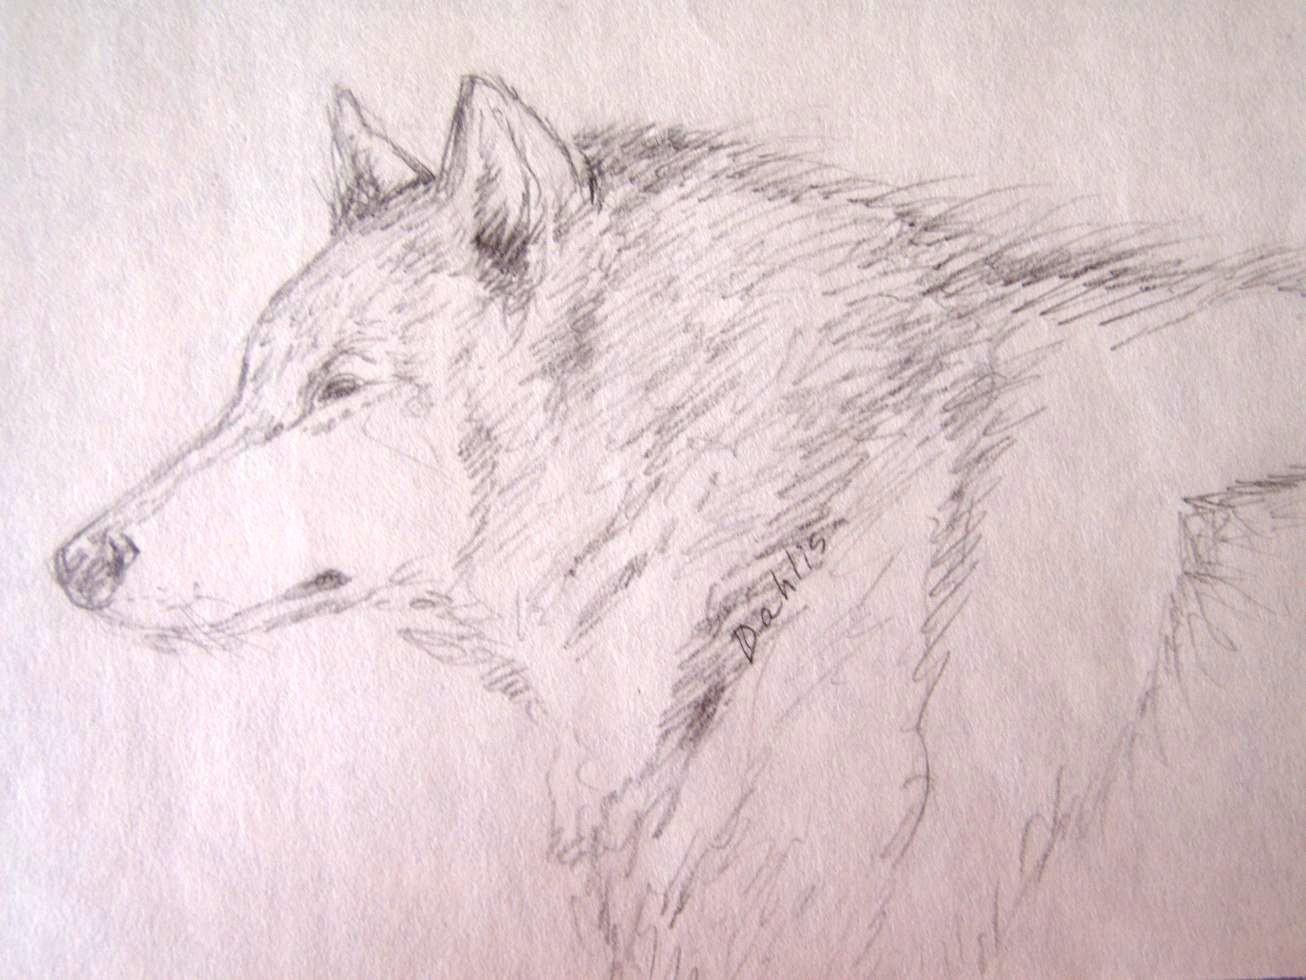 blue star sirius the wolf - photo #4